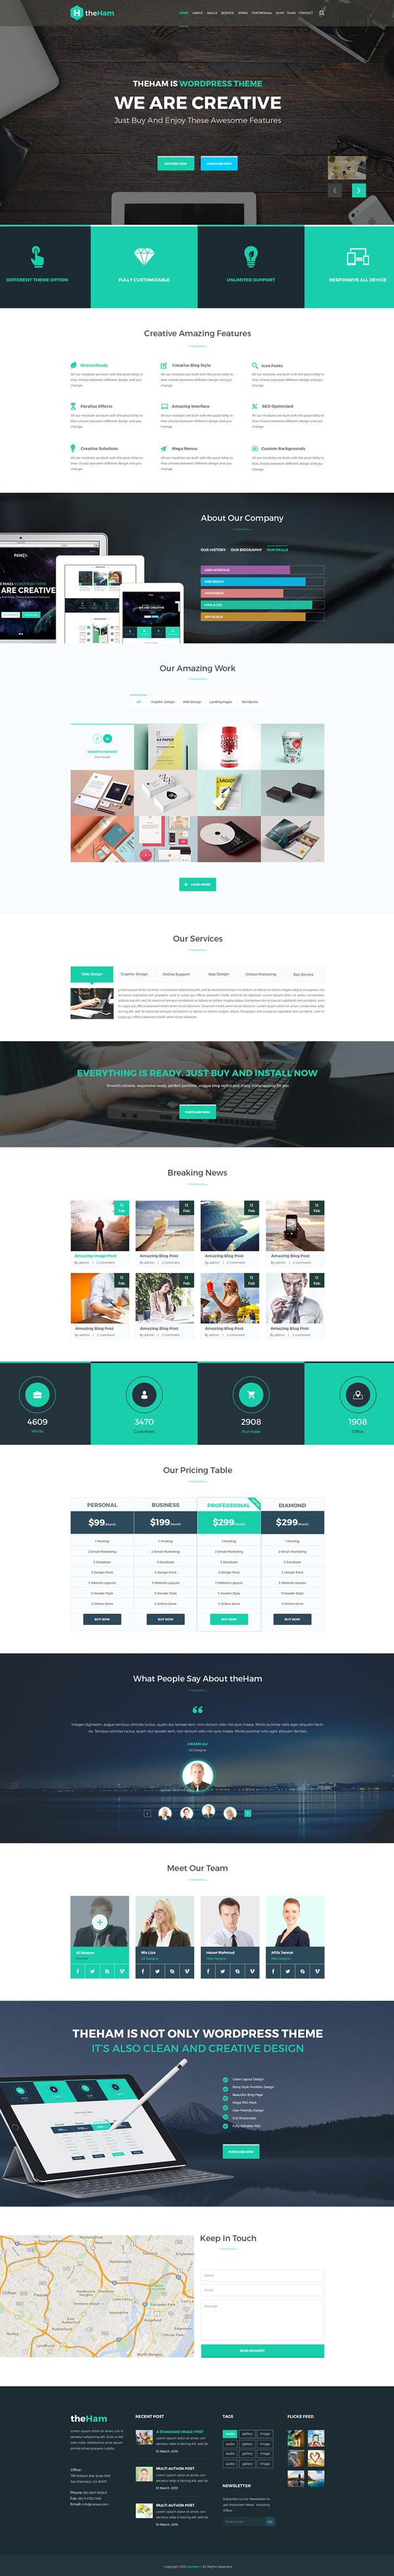 15 free responsive psd website templates idevie free creative landing page psd template maxwellsz